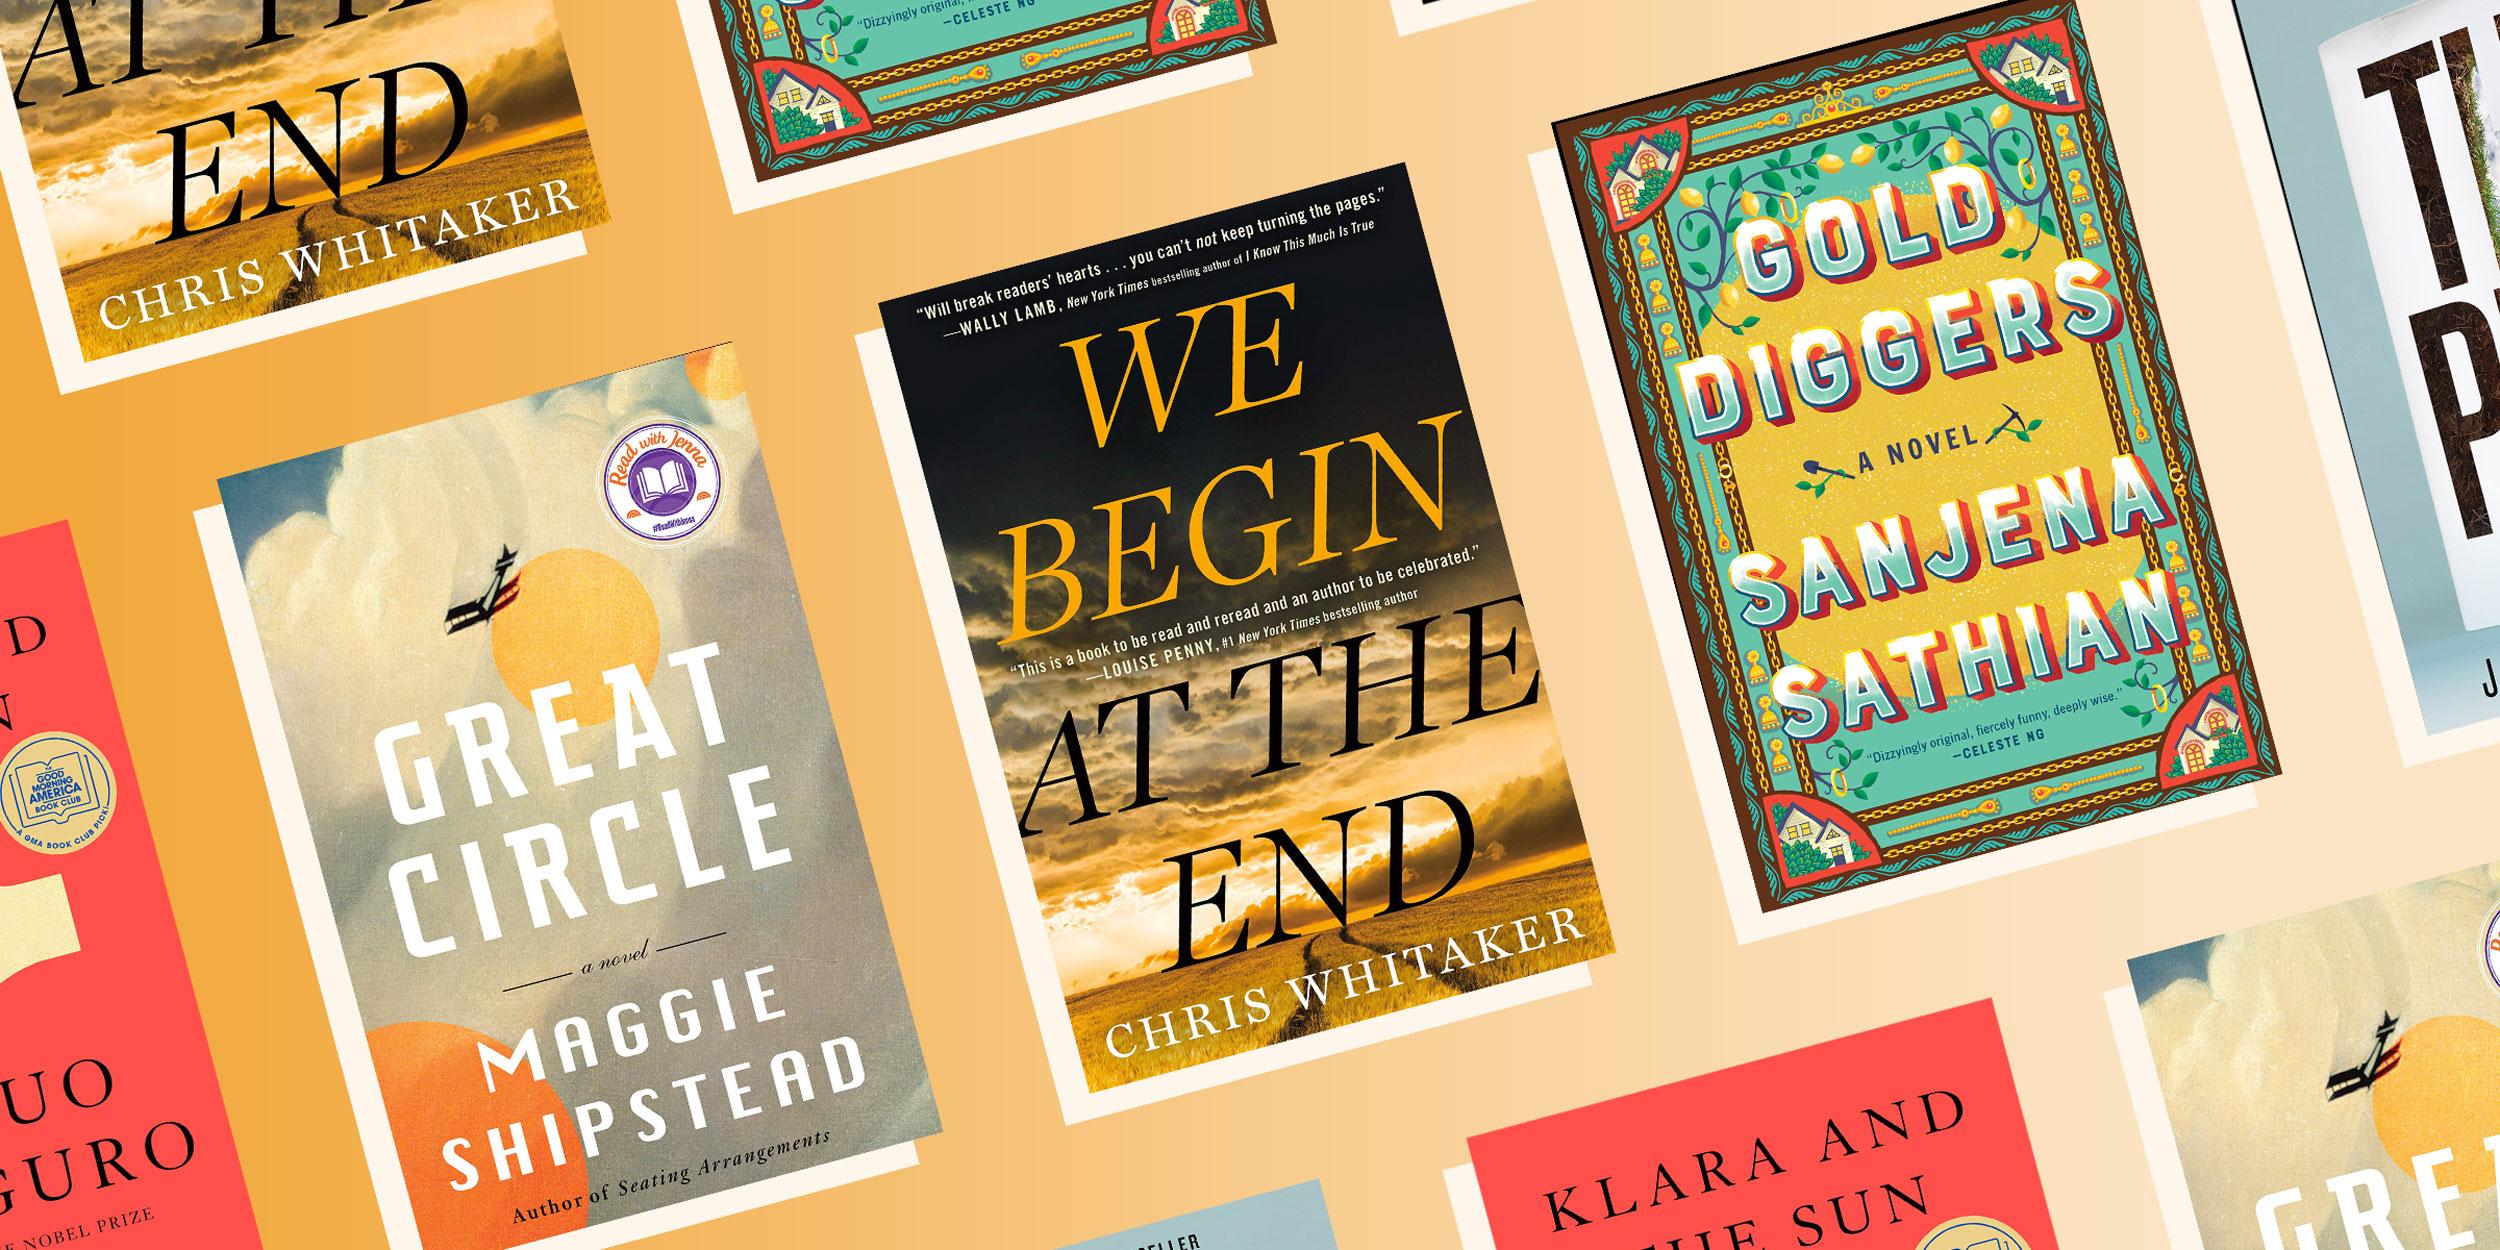 10 best books in 1021, according to Amazon's editors